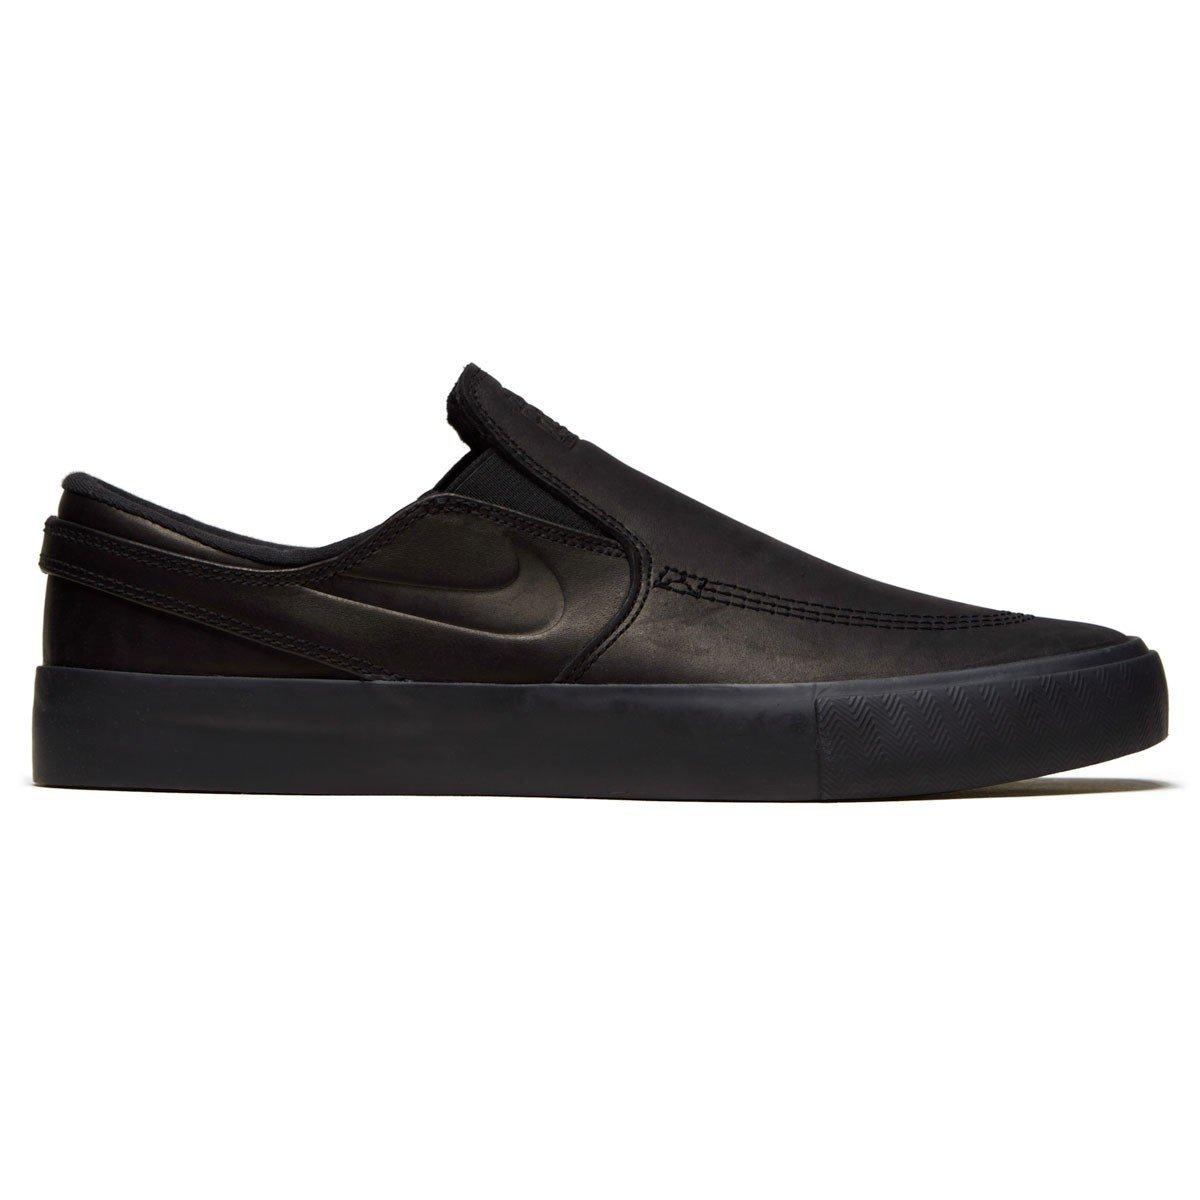 Nike SB Zoom Stefan Janoski Slip RM ISO Black/Leather